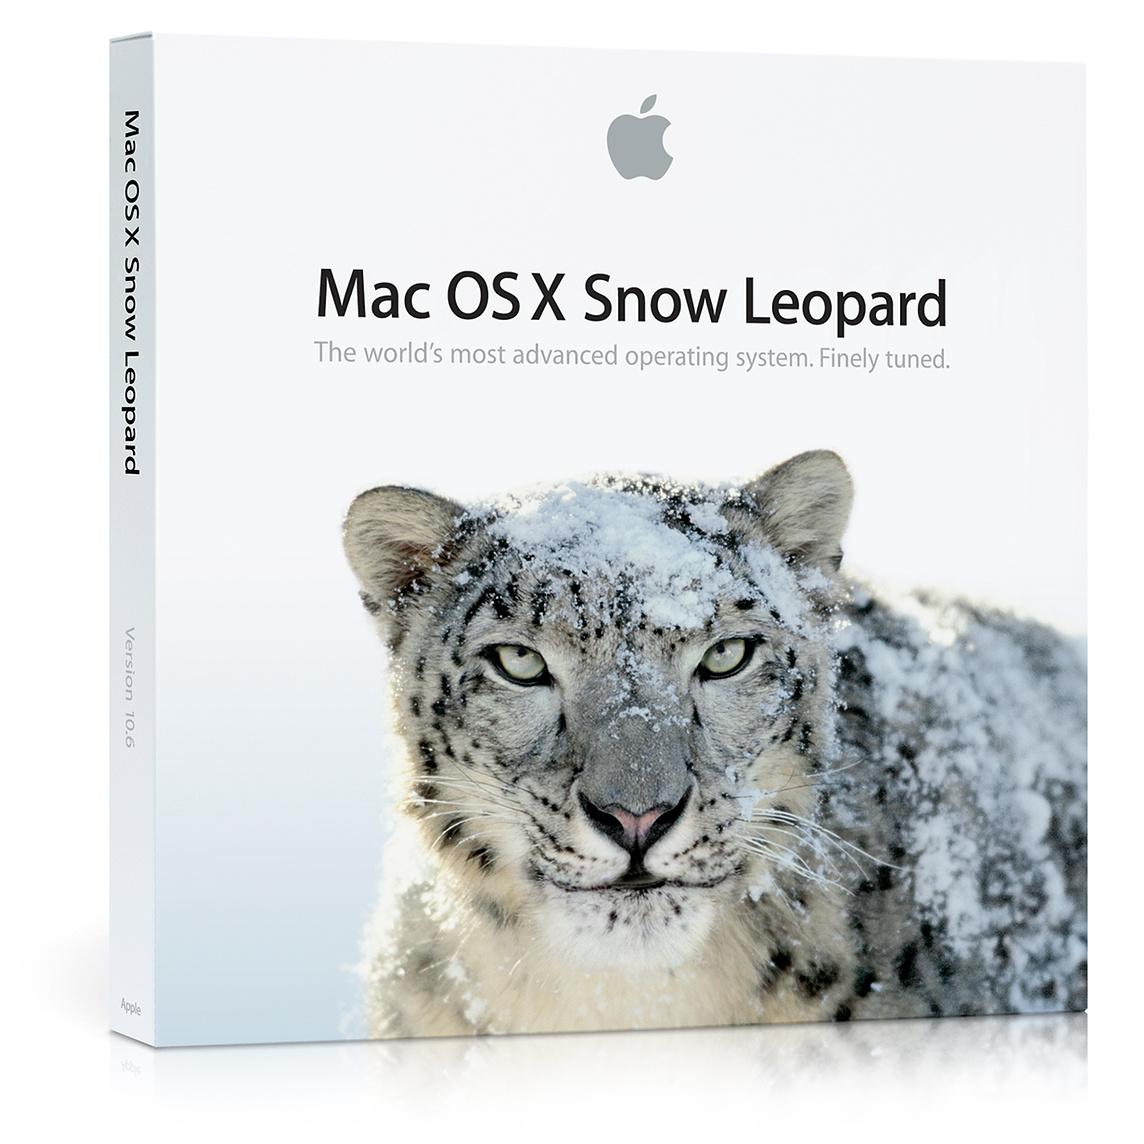 Mac OS X 10.6 Snow Leopard Free Download